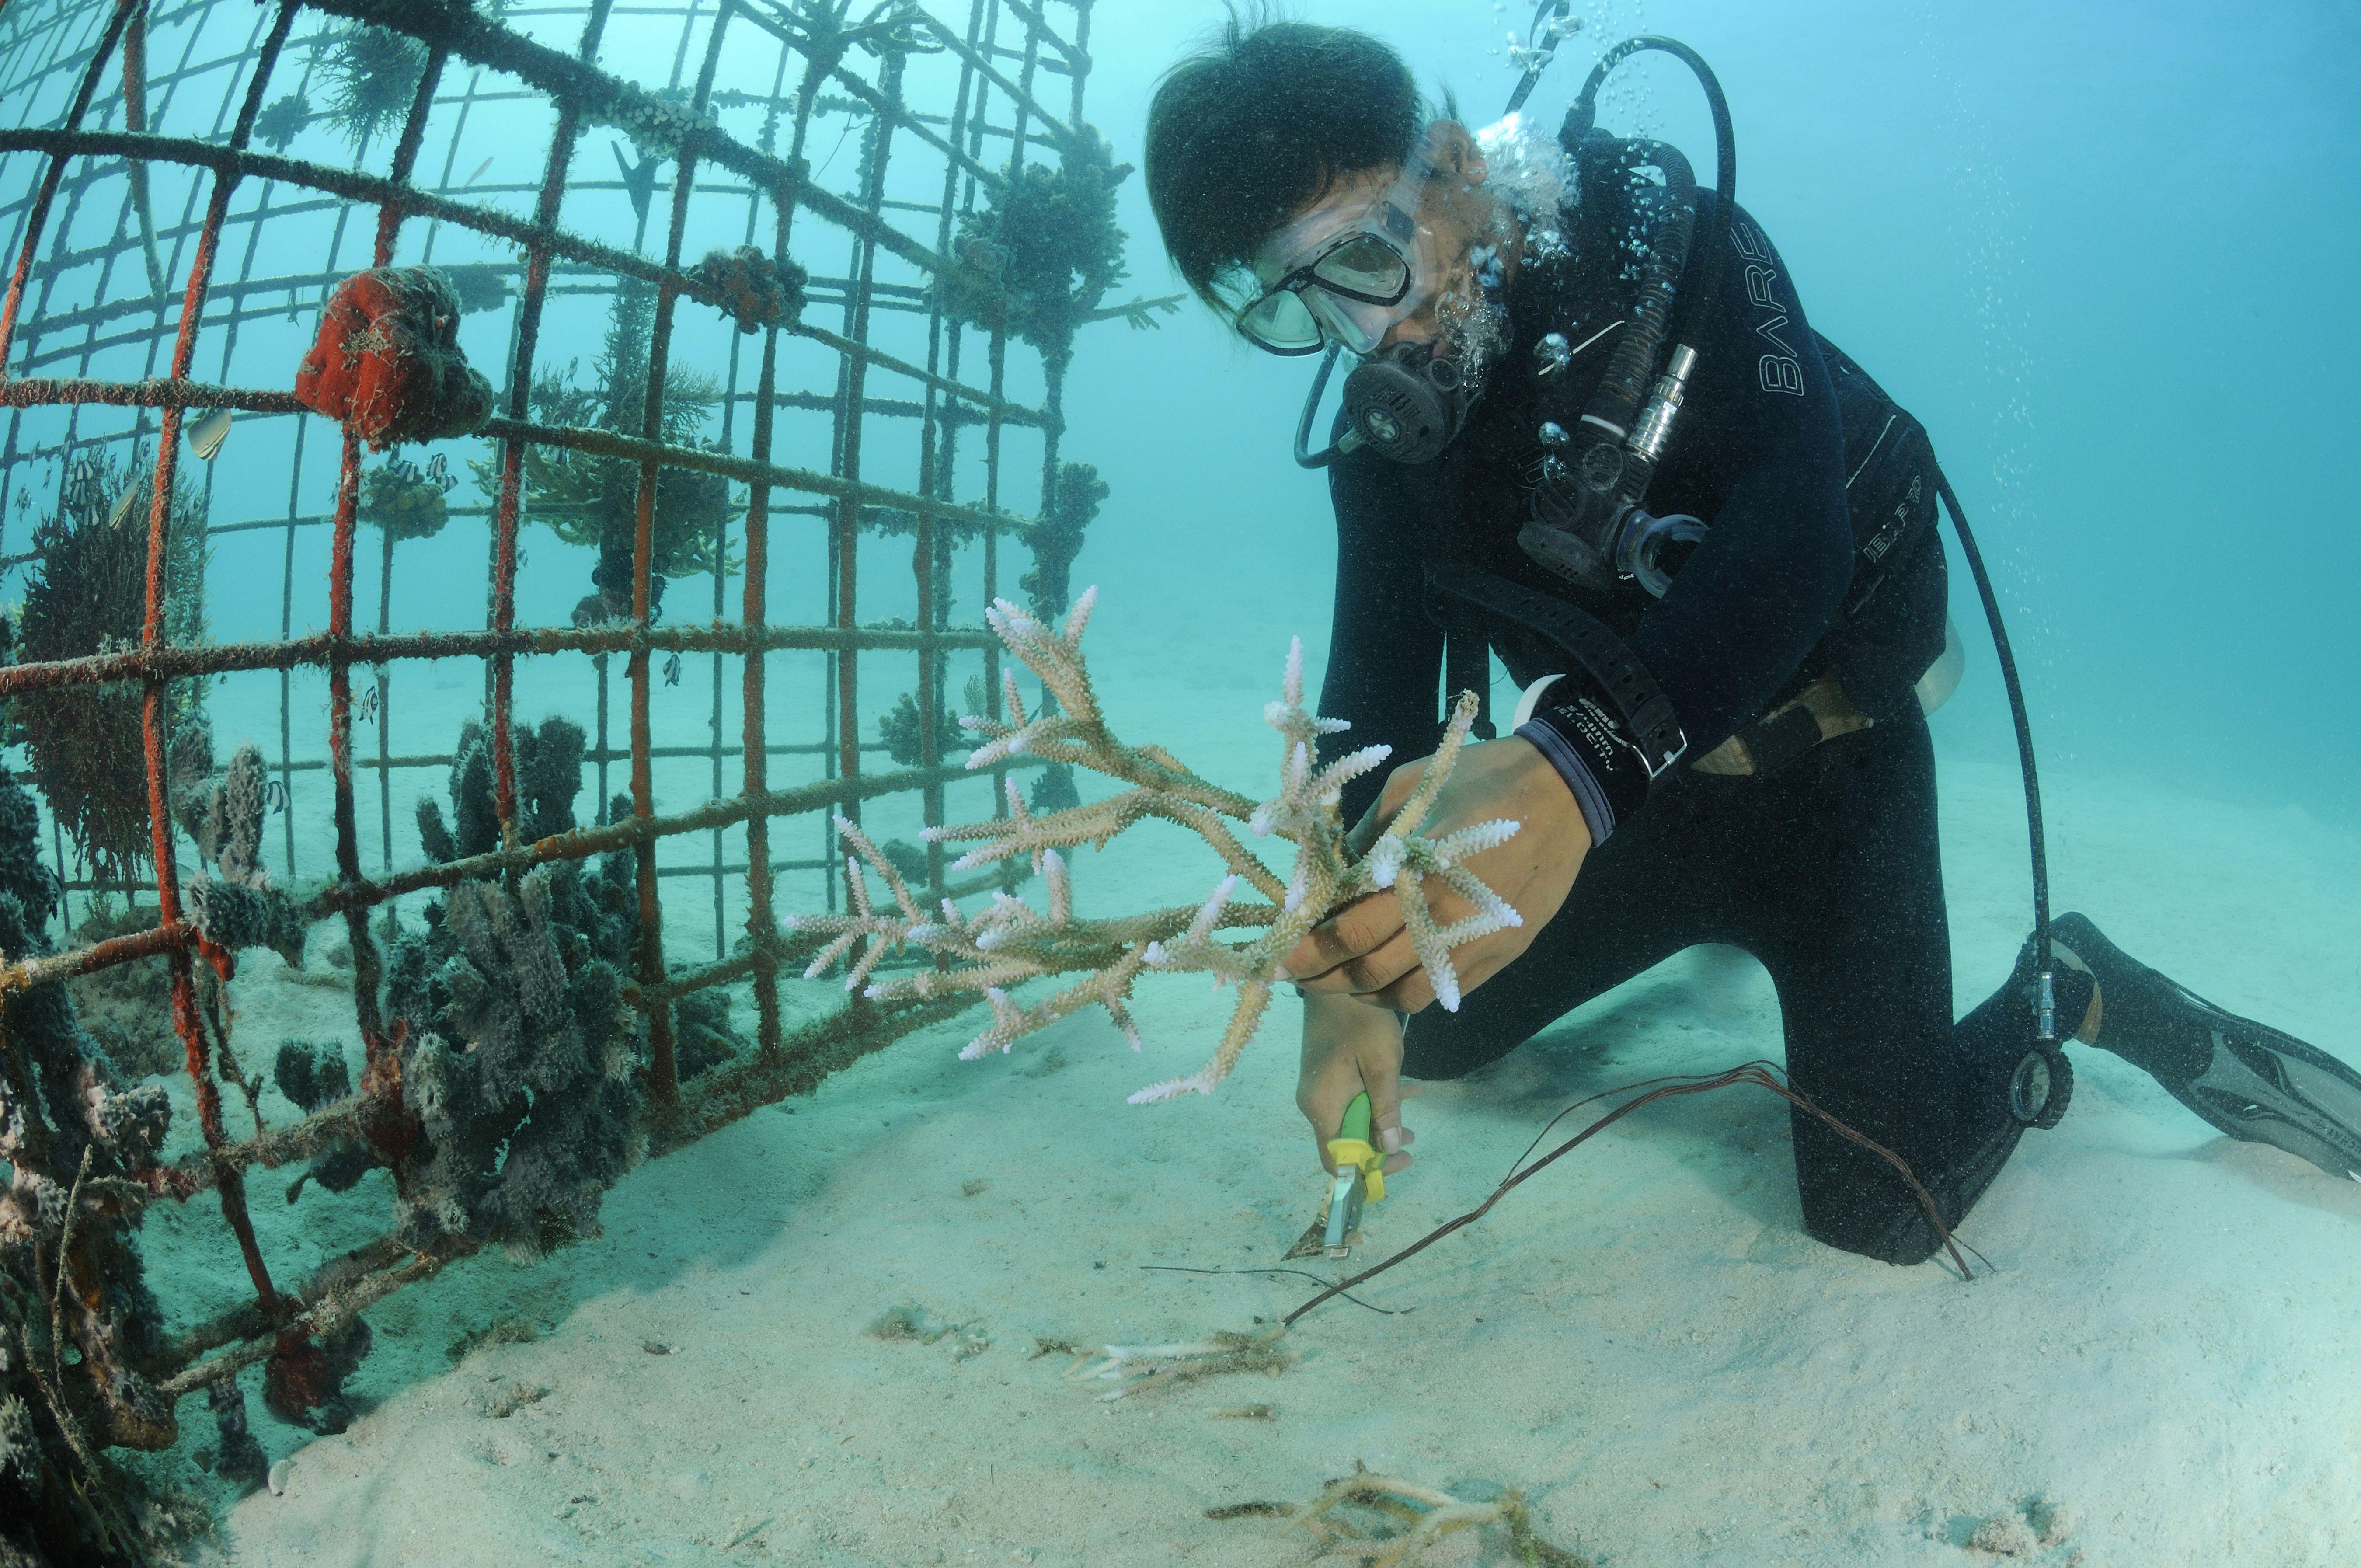 Reef gardener attaching corals to artificial reef, Pemuteran, Bali, Indonesia